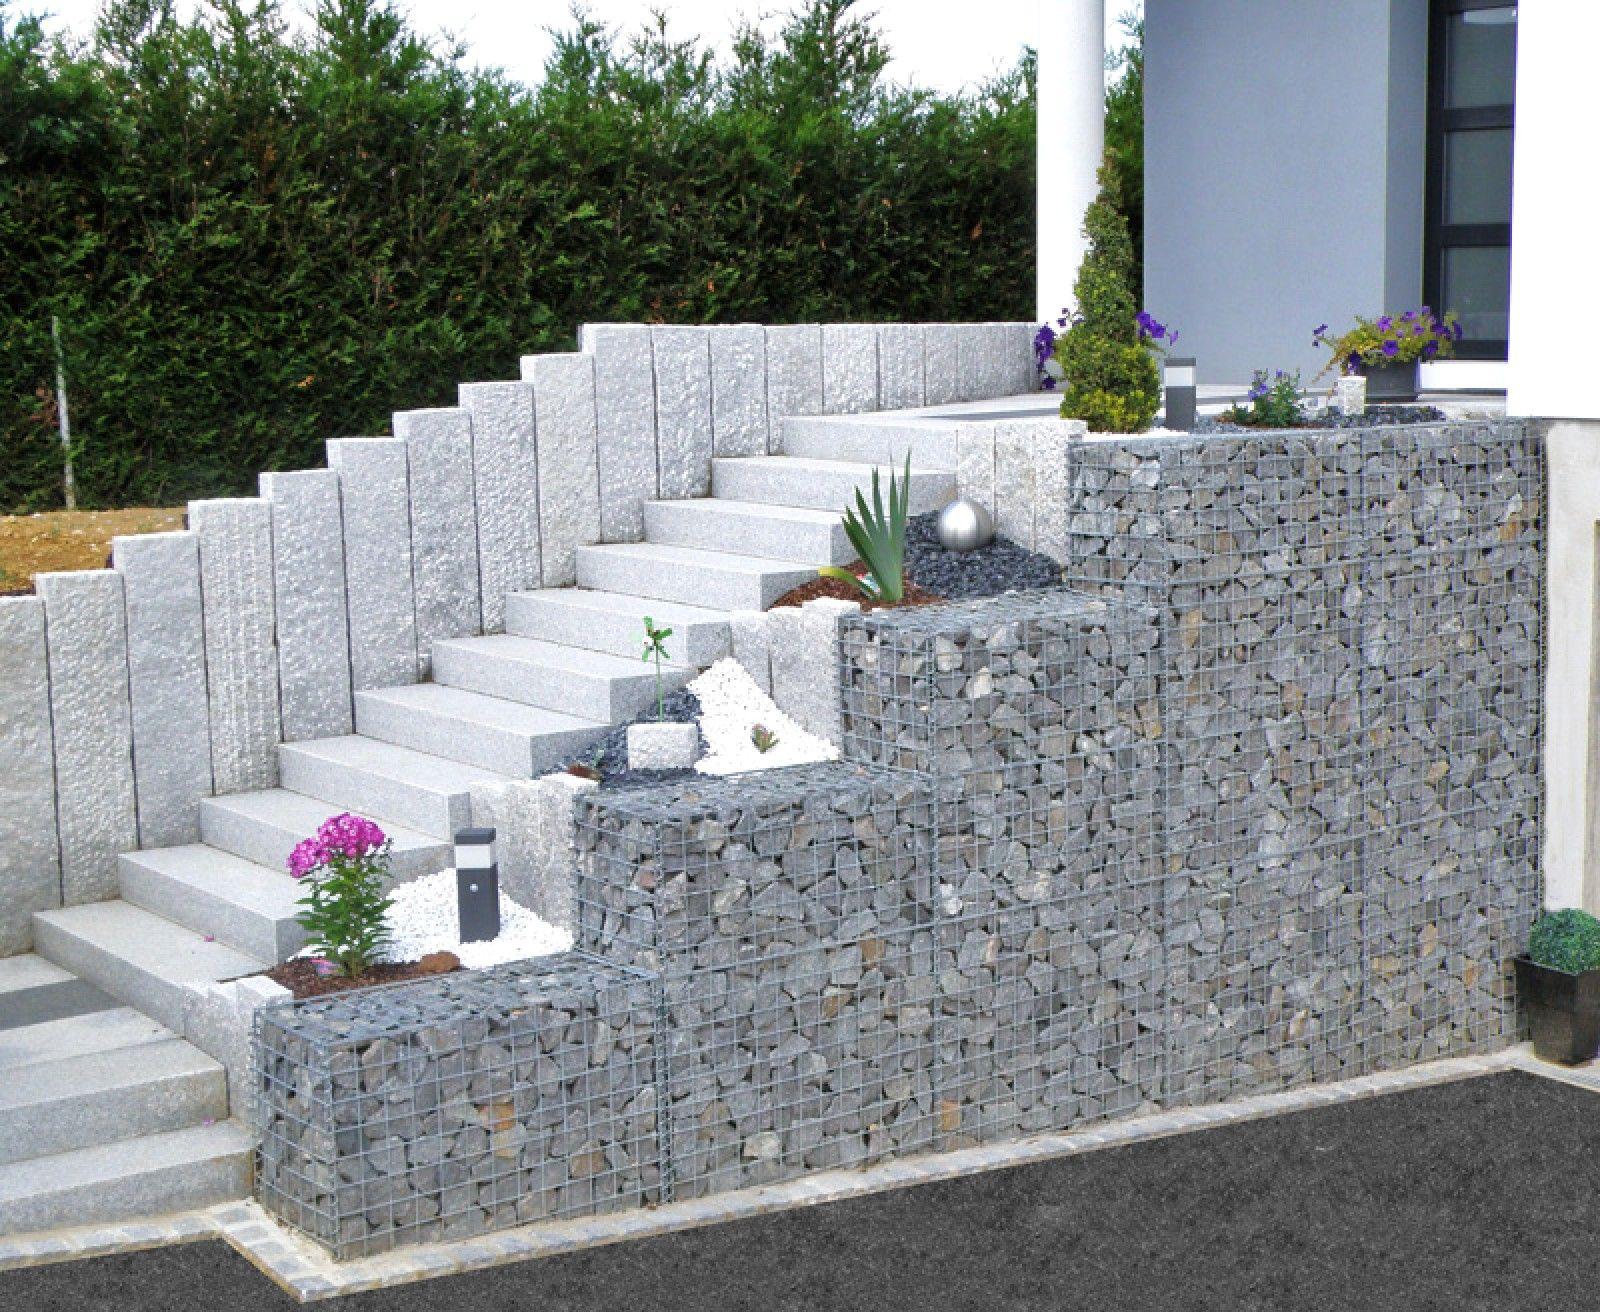 49 fascinating gabion decorating ideas for your outdoor garden